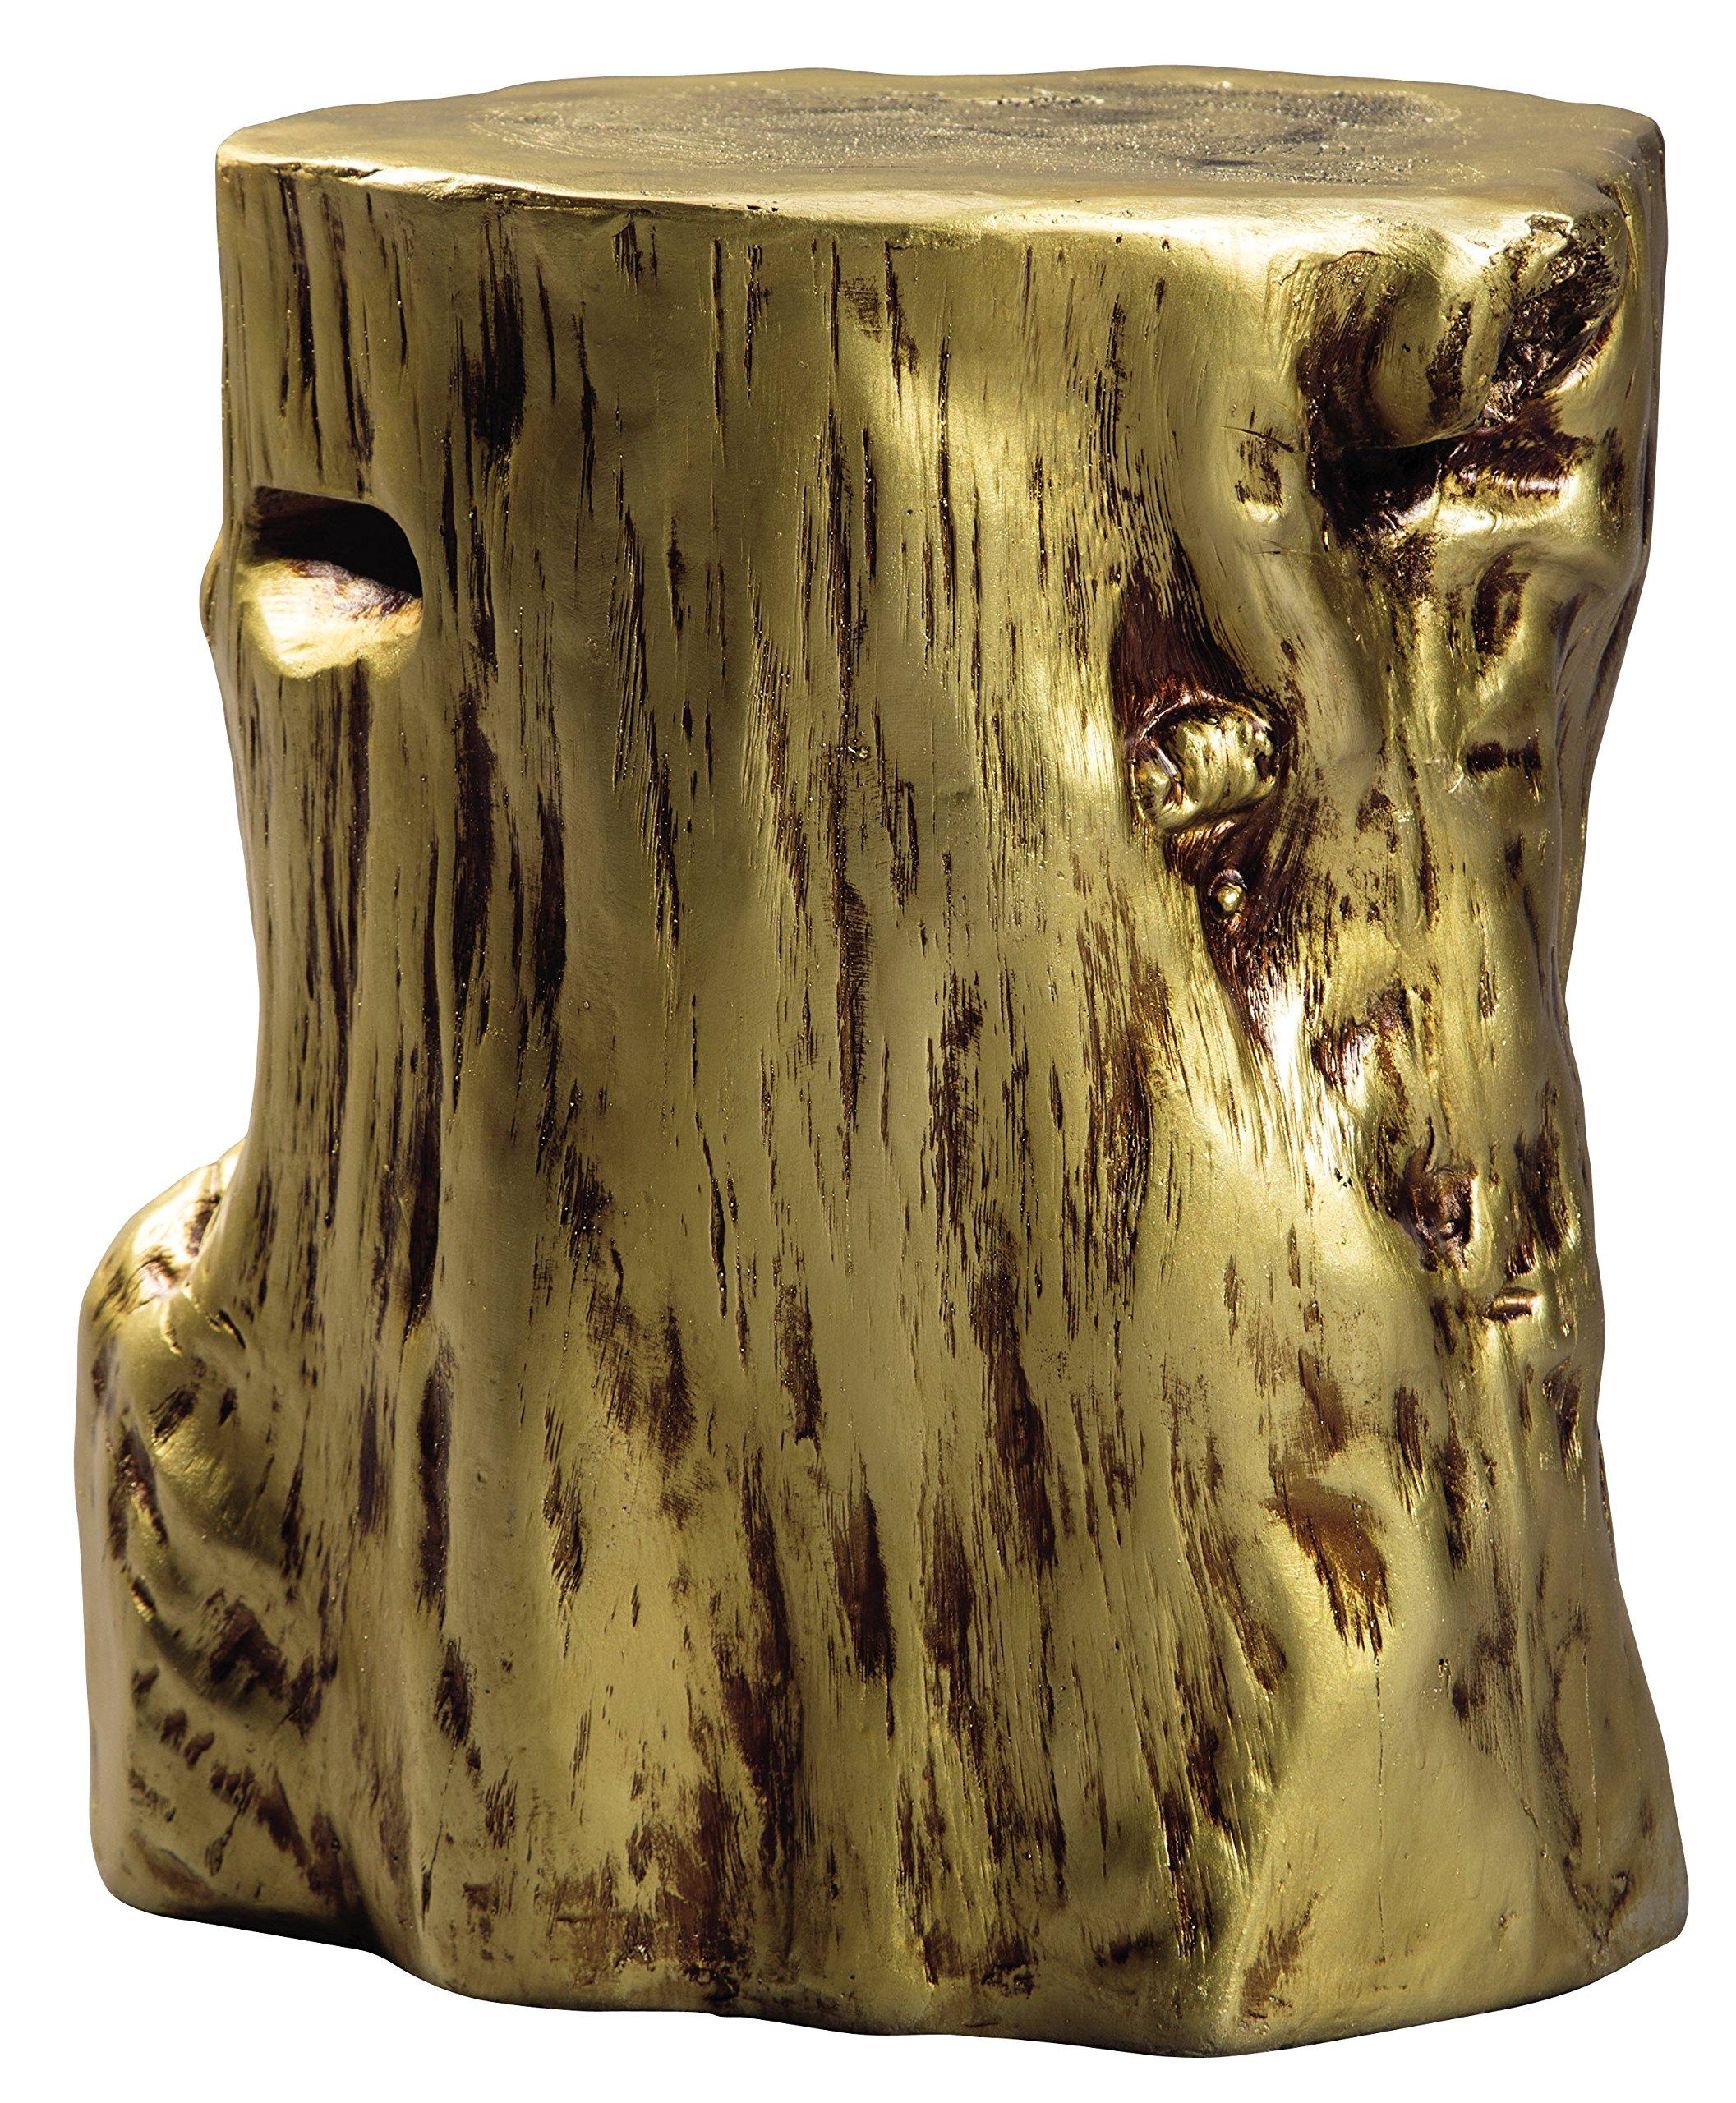 Ashley Furniture Signature Design - Majaci Accent Table - Contemporary - Antique Gold Finish - Tree Stump Design